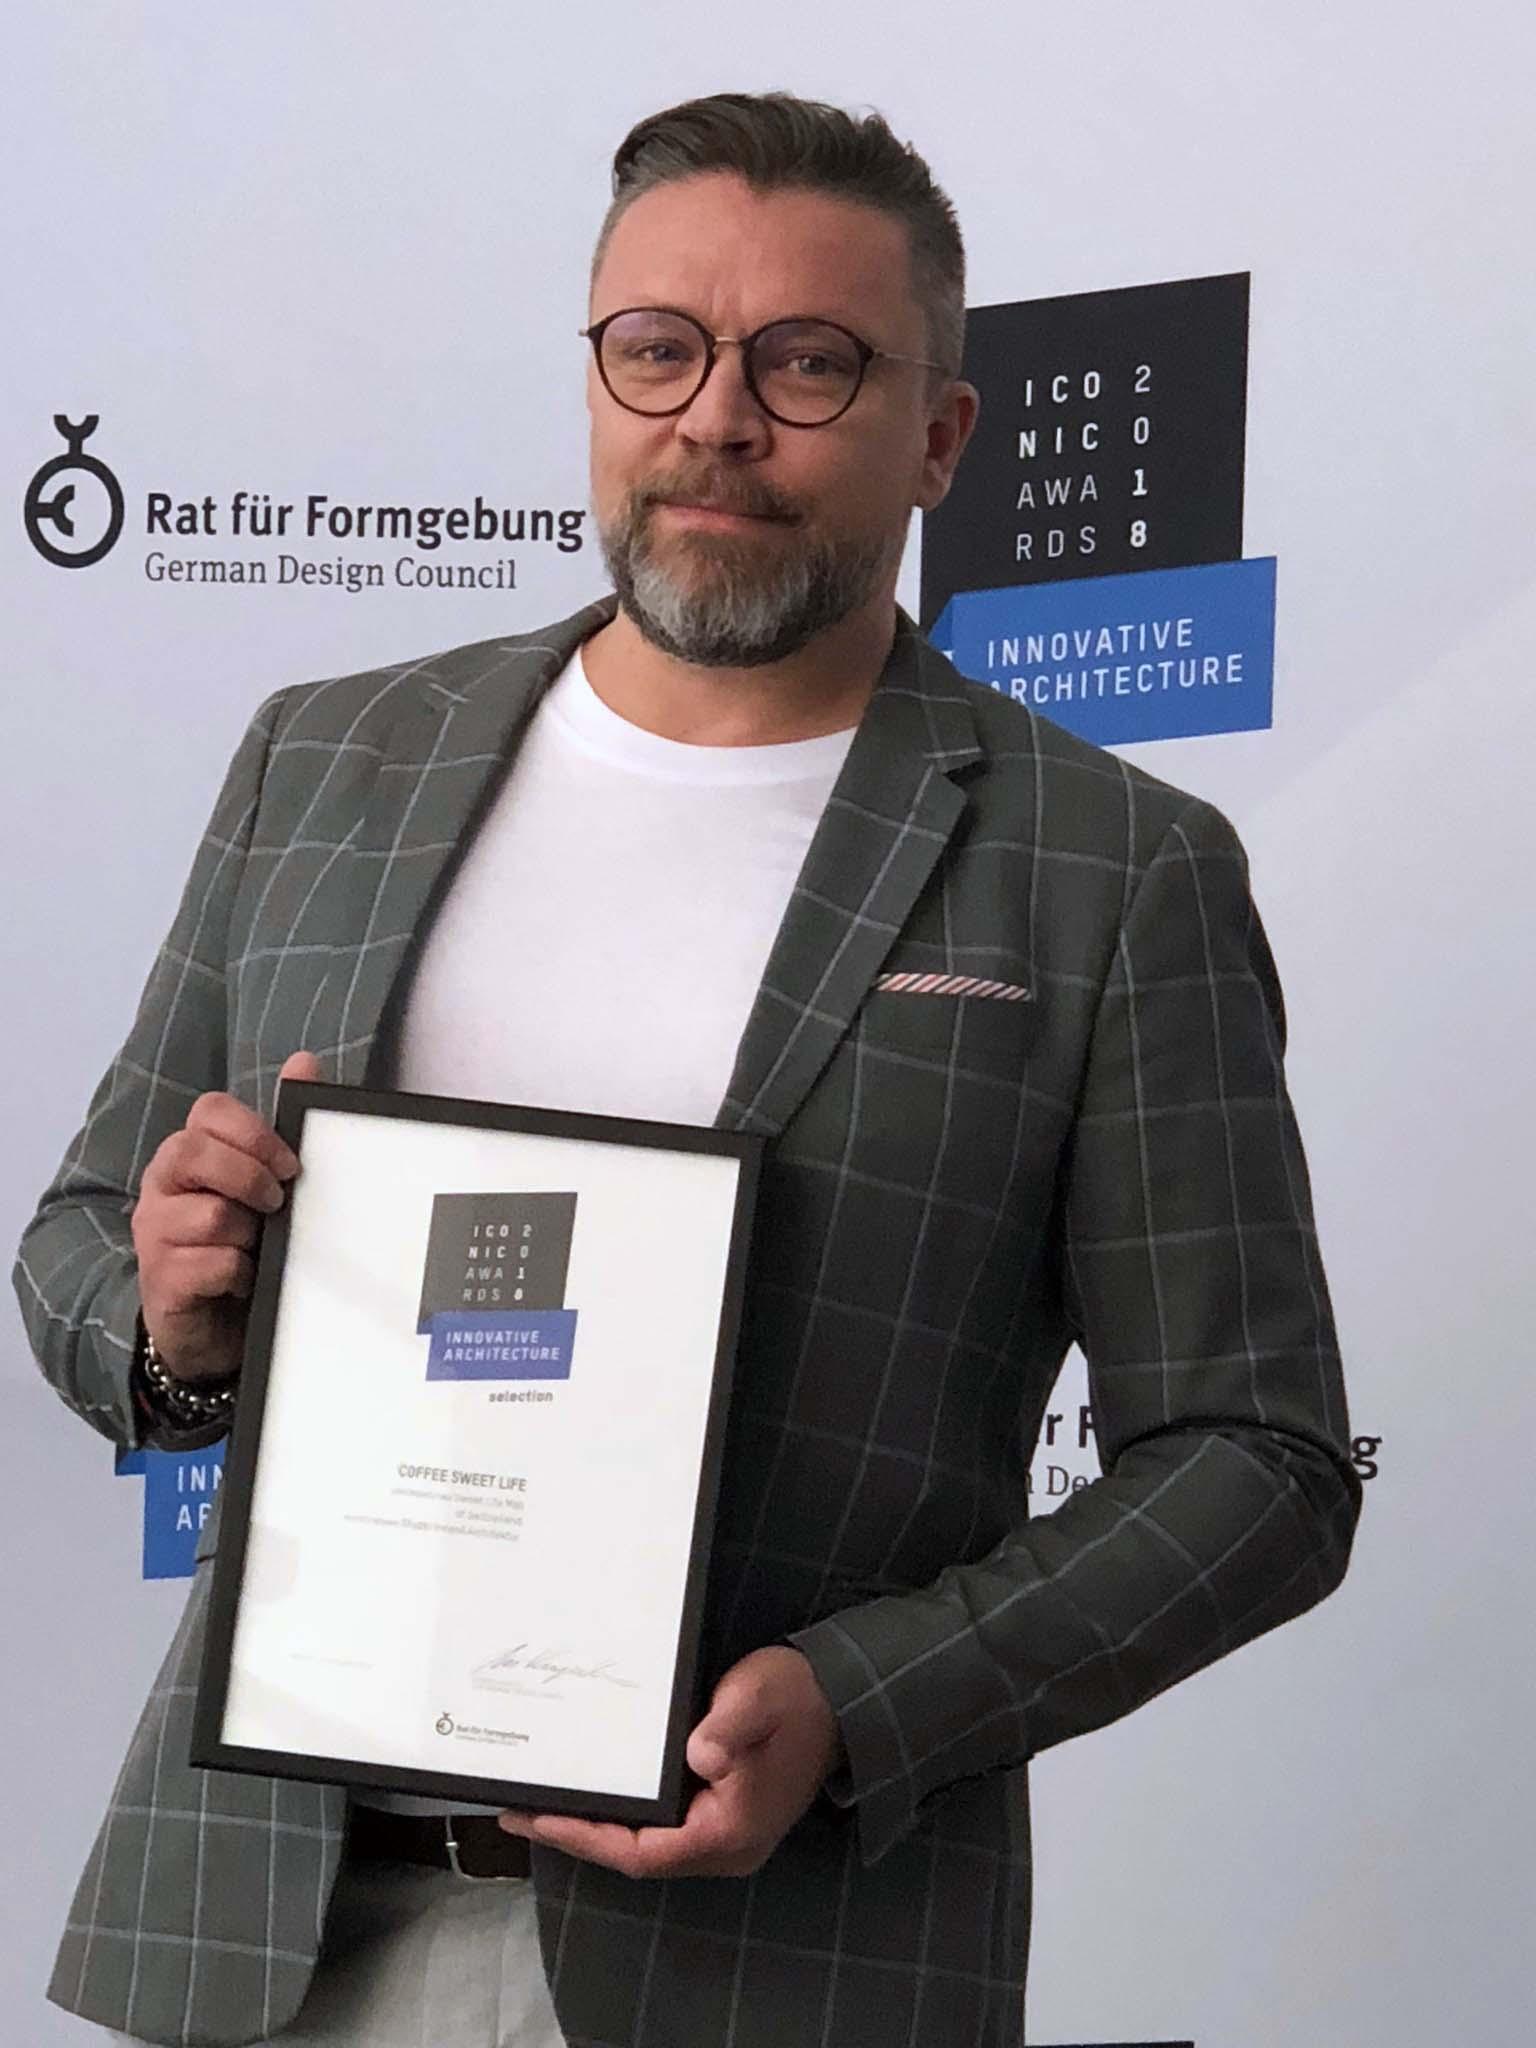 ICONIC AWARD 2018 München Florian Studer.jpg